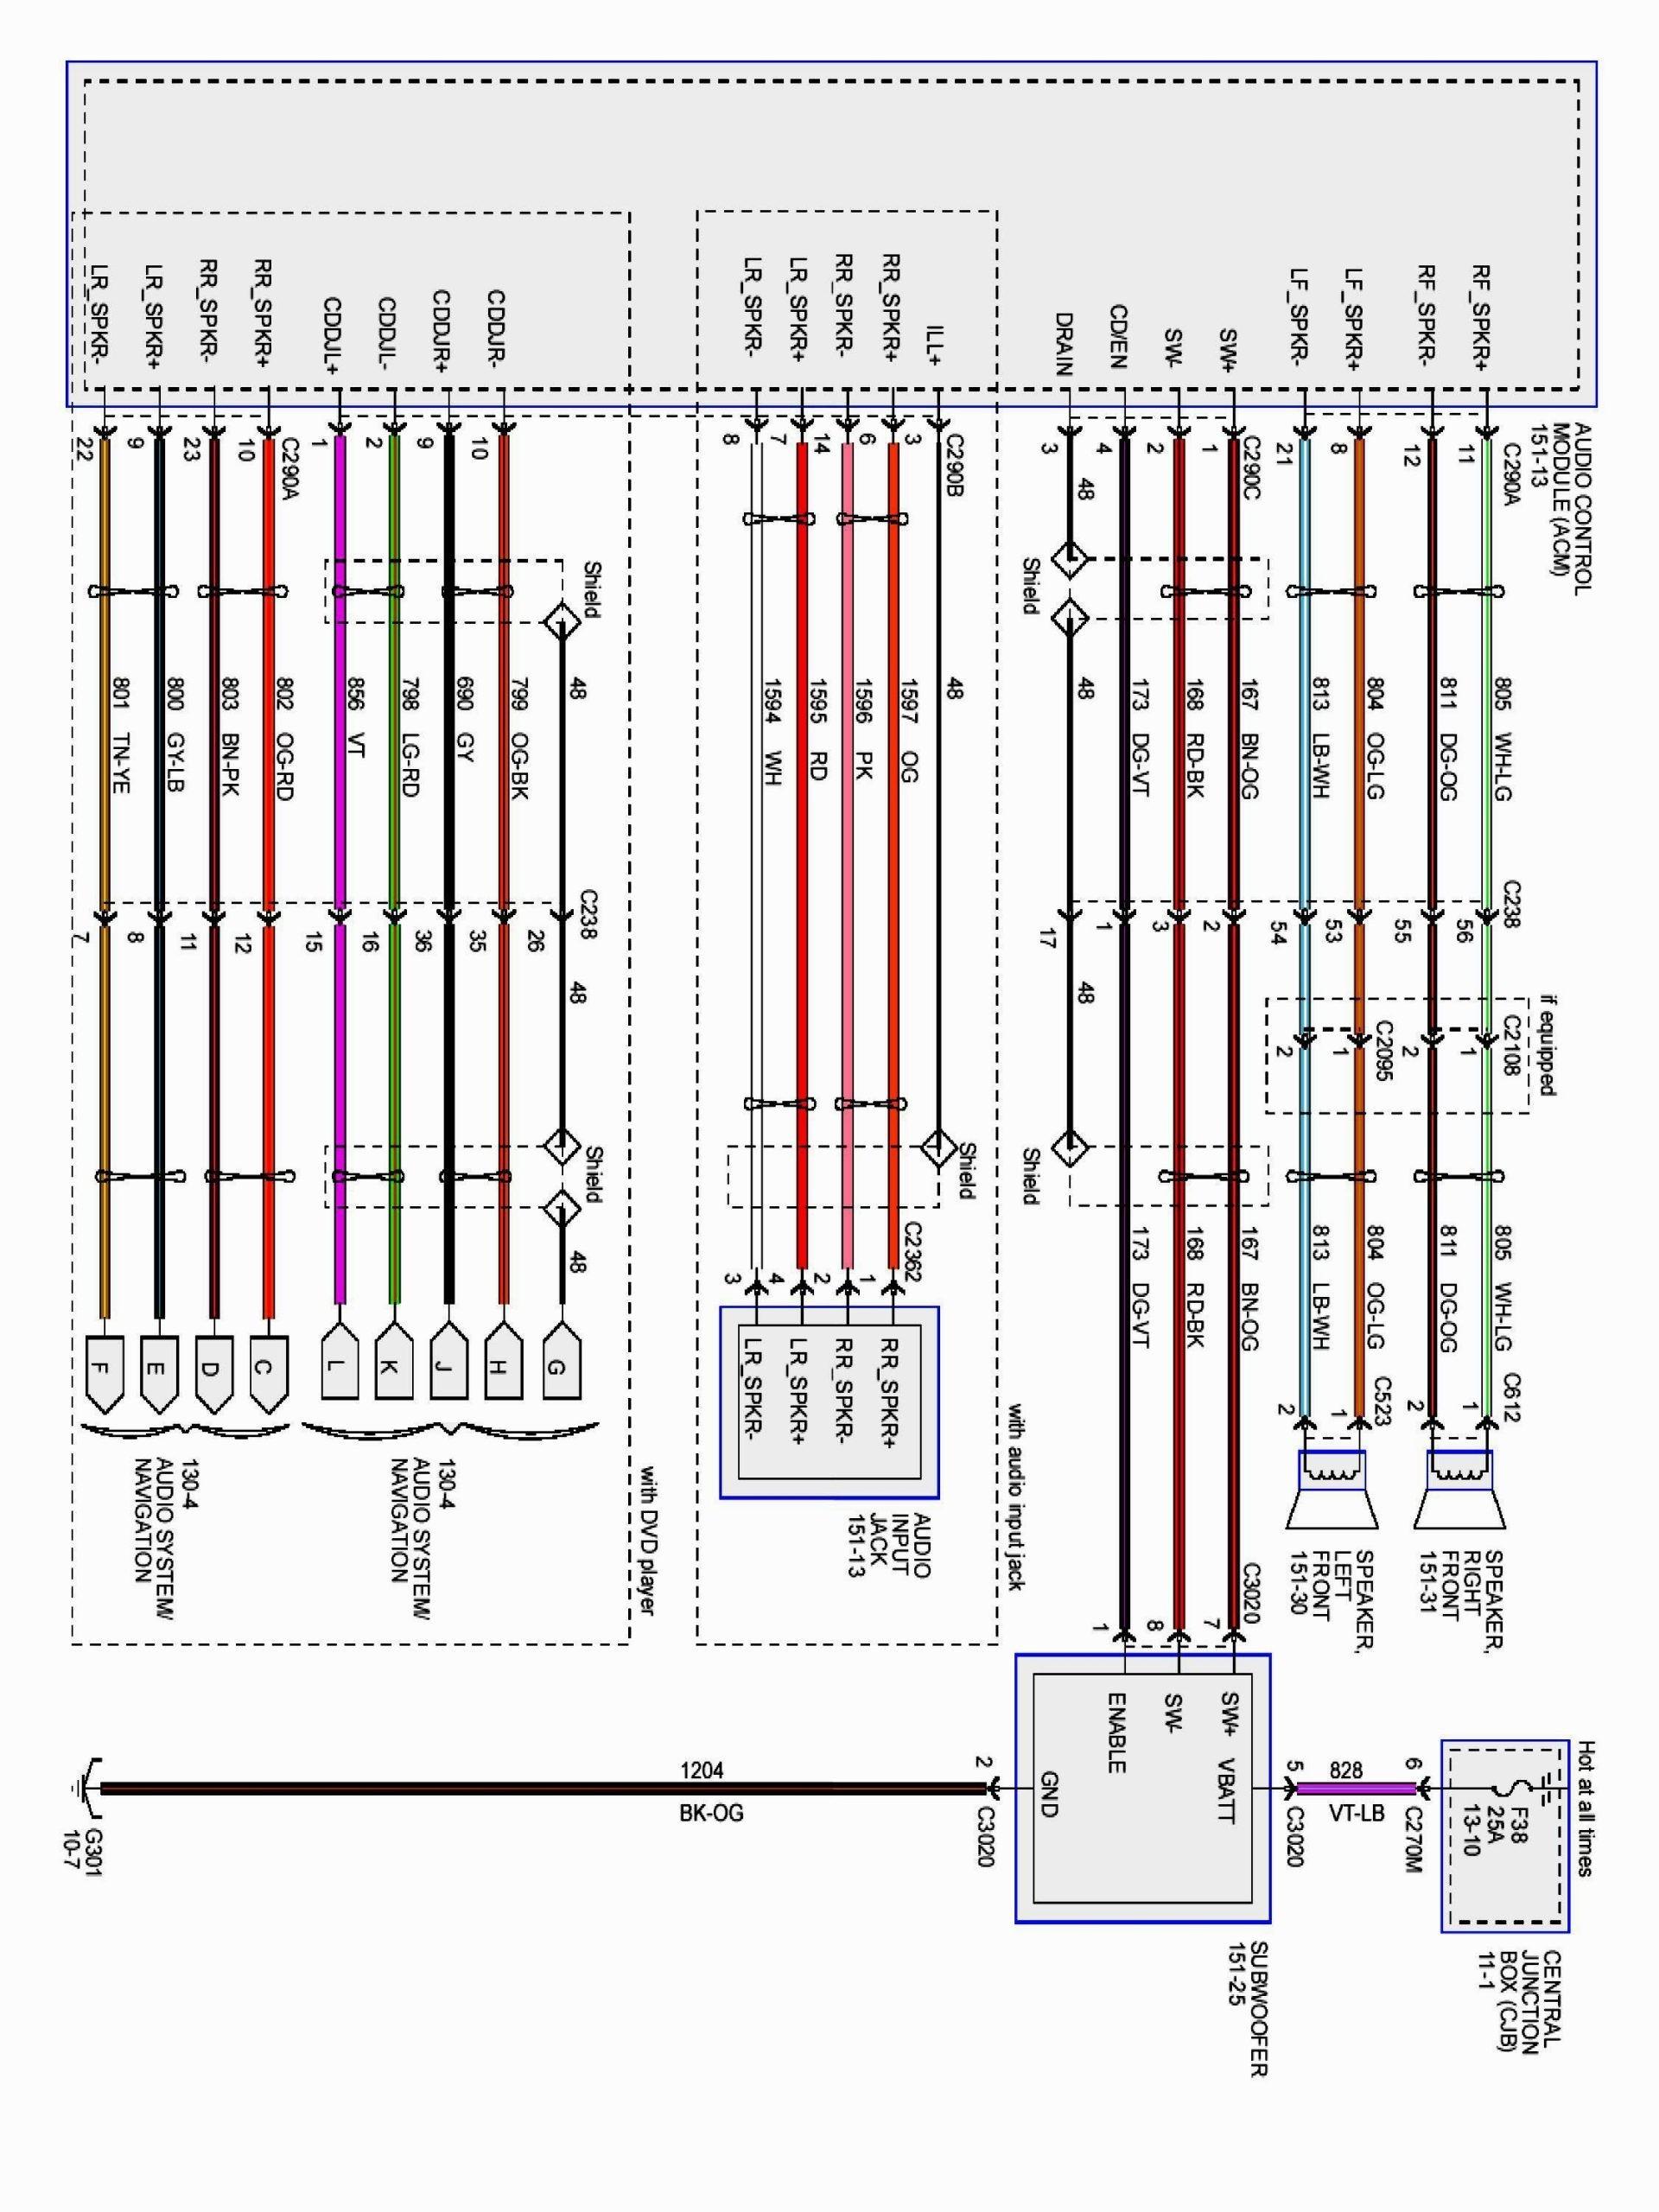 clarion cz100 radio wiring diagram 2000 dodge caravan nx700e and electrical nx409 rh 11 nijsshop be harness